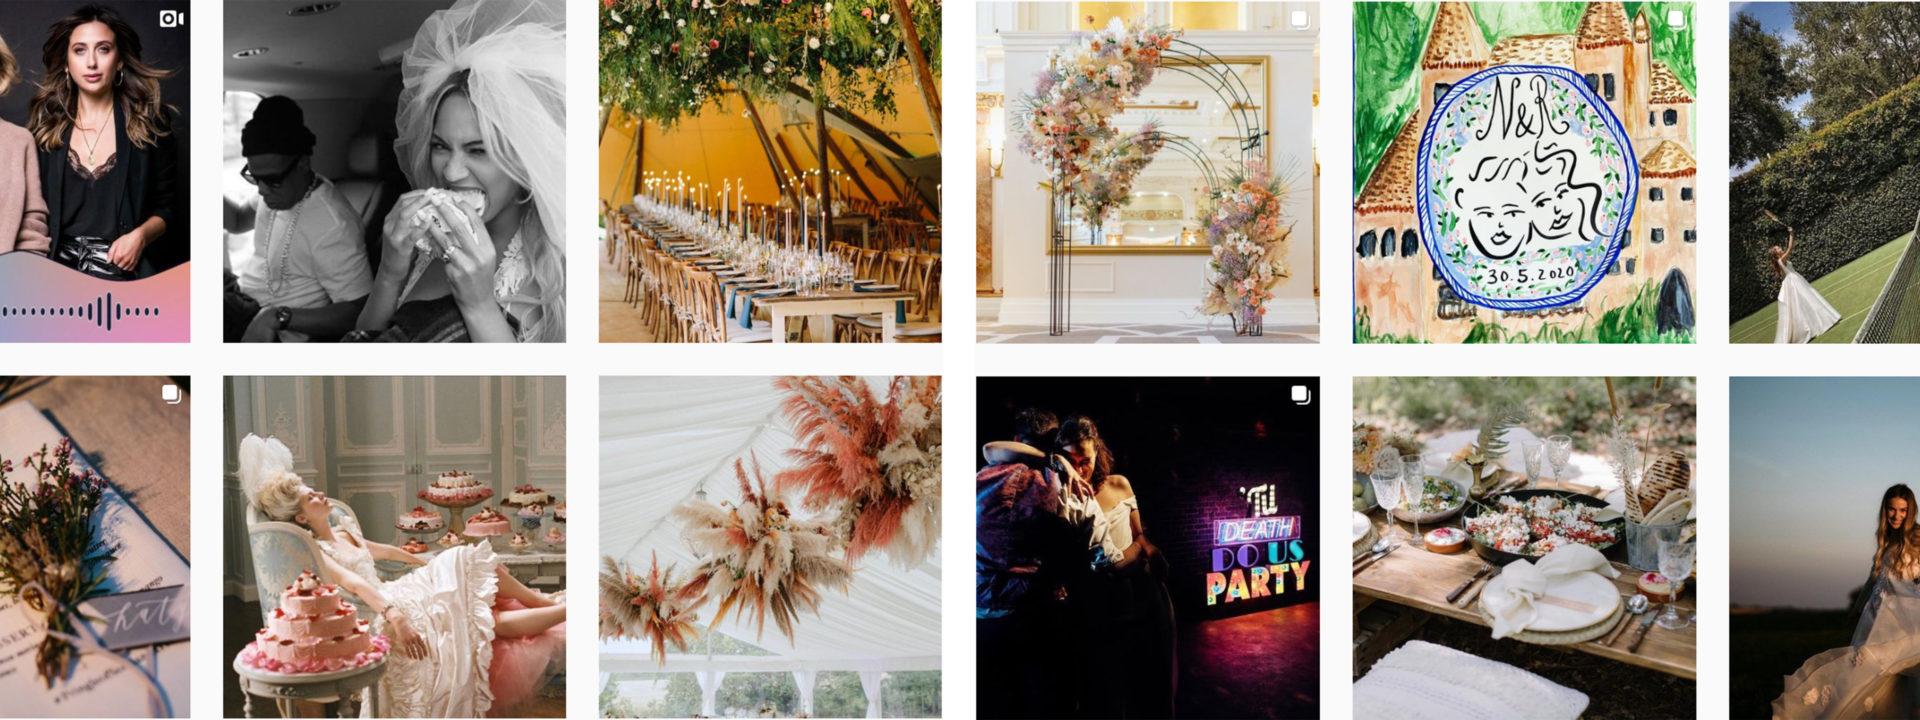 Event planning instagram account